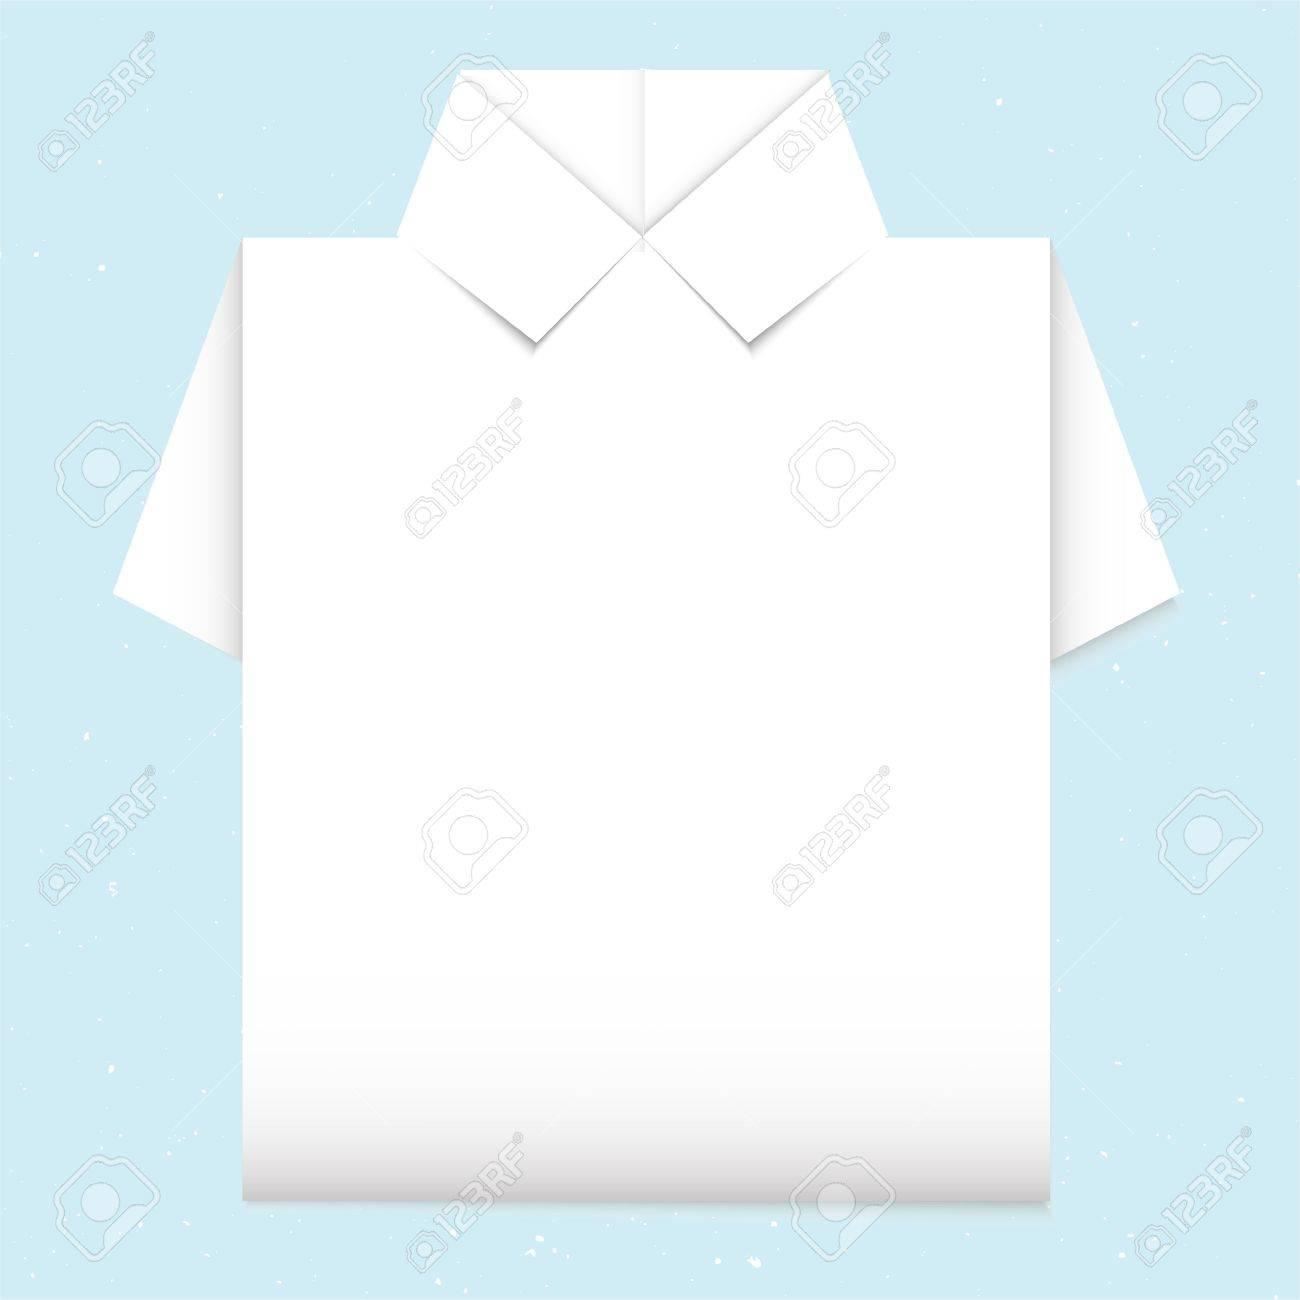 Blank Shirt Origami Royalty Free Cliparts Vectors And Stock